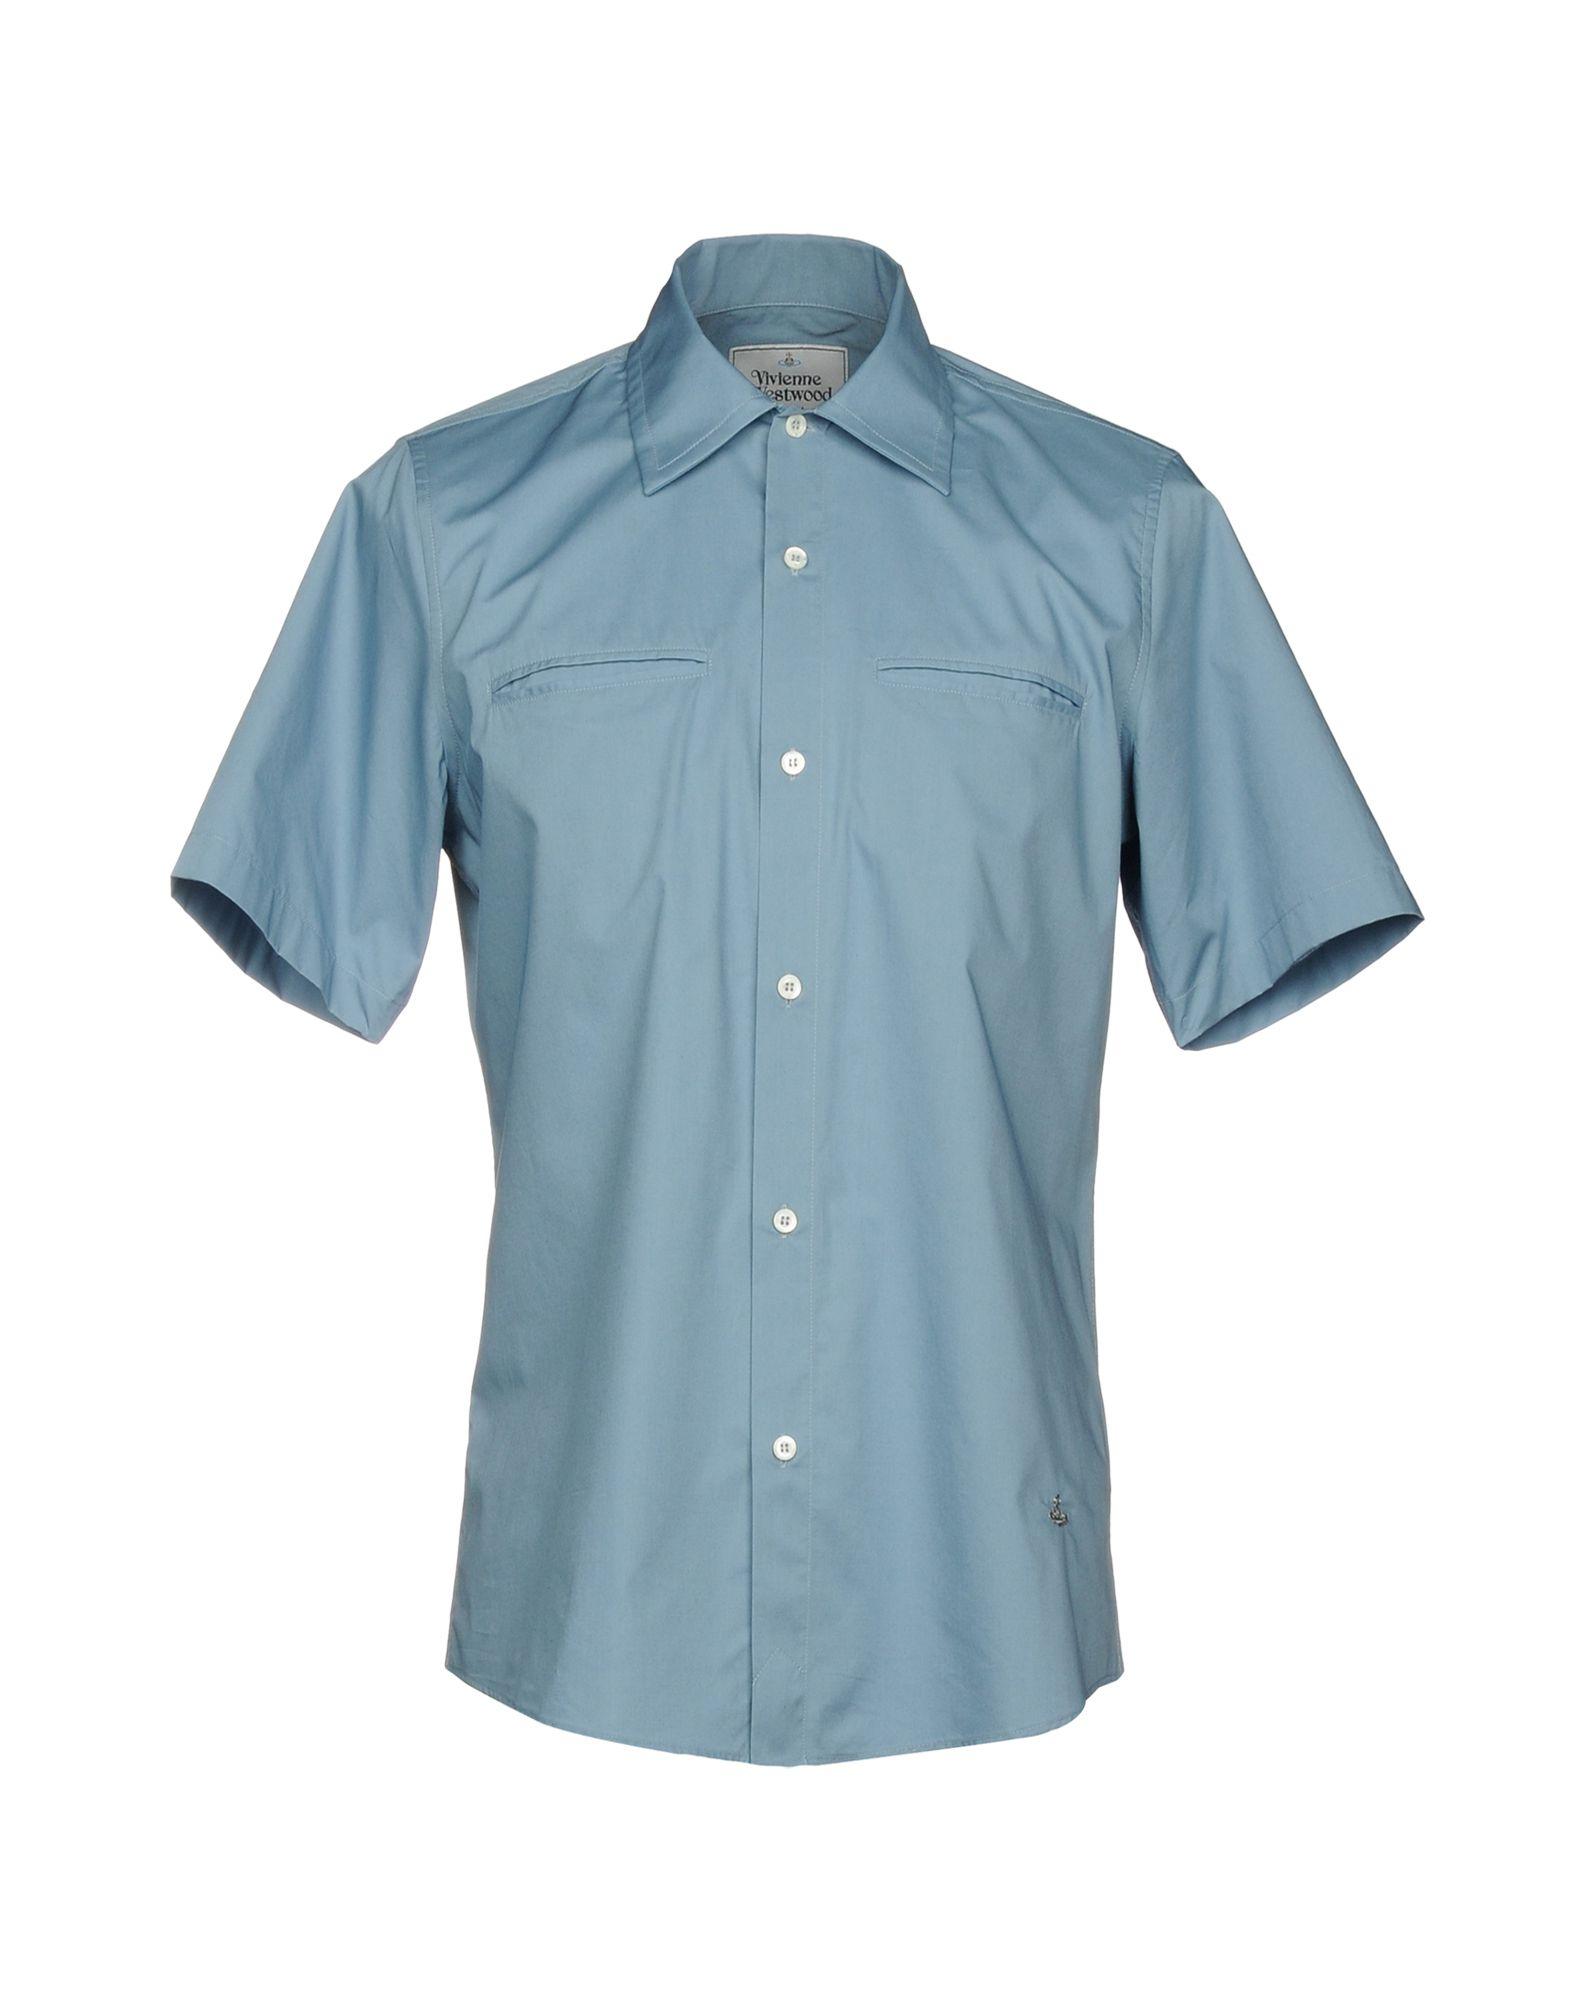 VIVIENNE WESTWOOD MAN Pубашка футболка vivienne westwood man vivienne westwood man vi873emrfb28